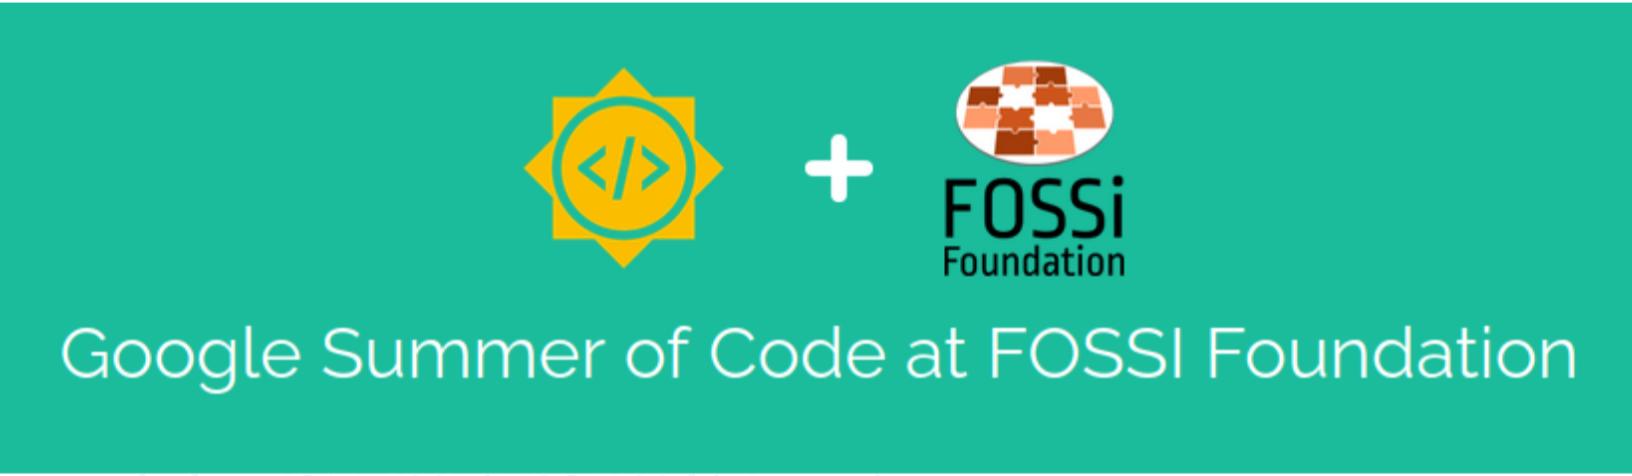 Google Summer of Code'21 at FOSSI Foundation: M-extension Support for SERV |  Zeeshan Rafique, RISC-V Ambassador